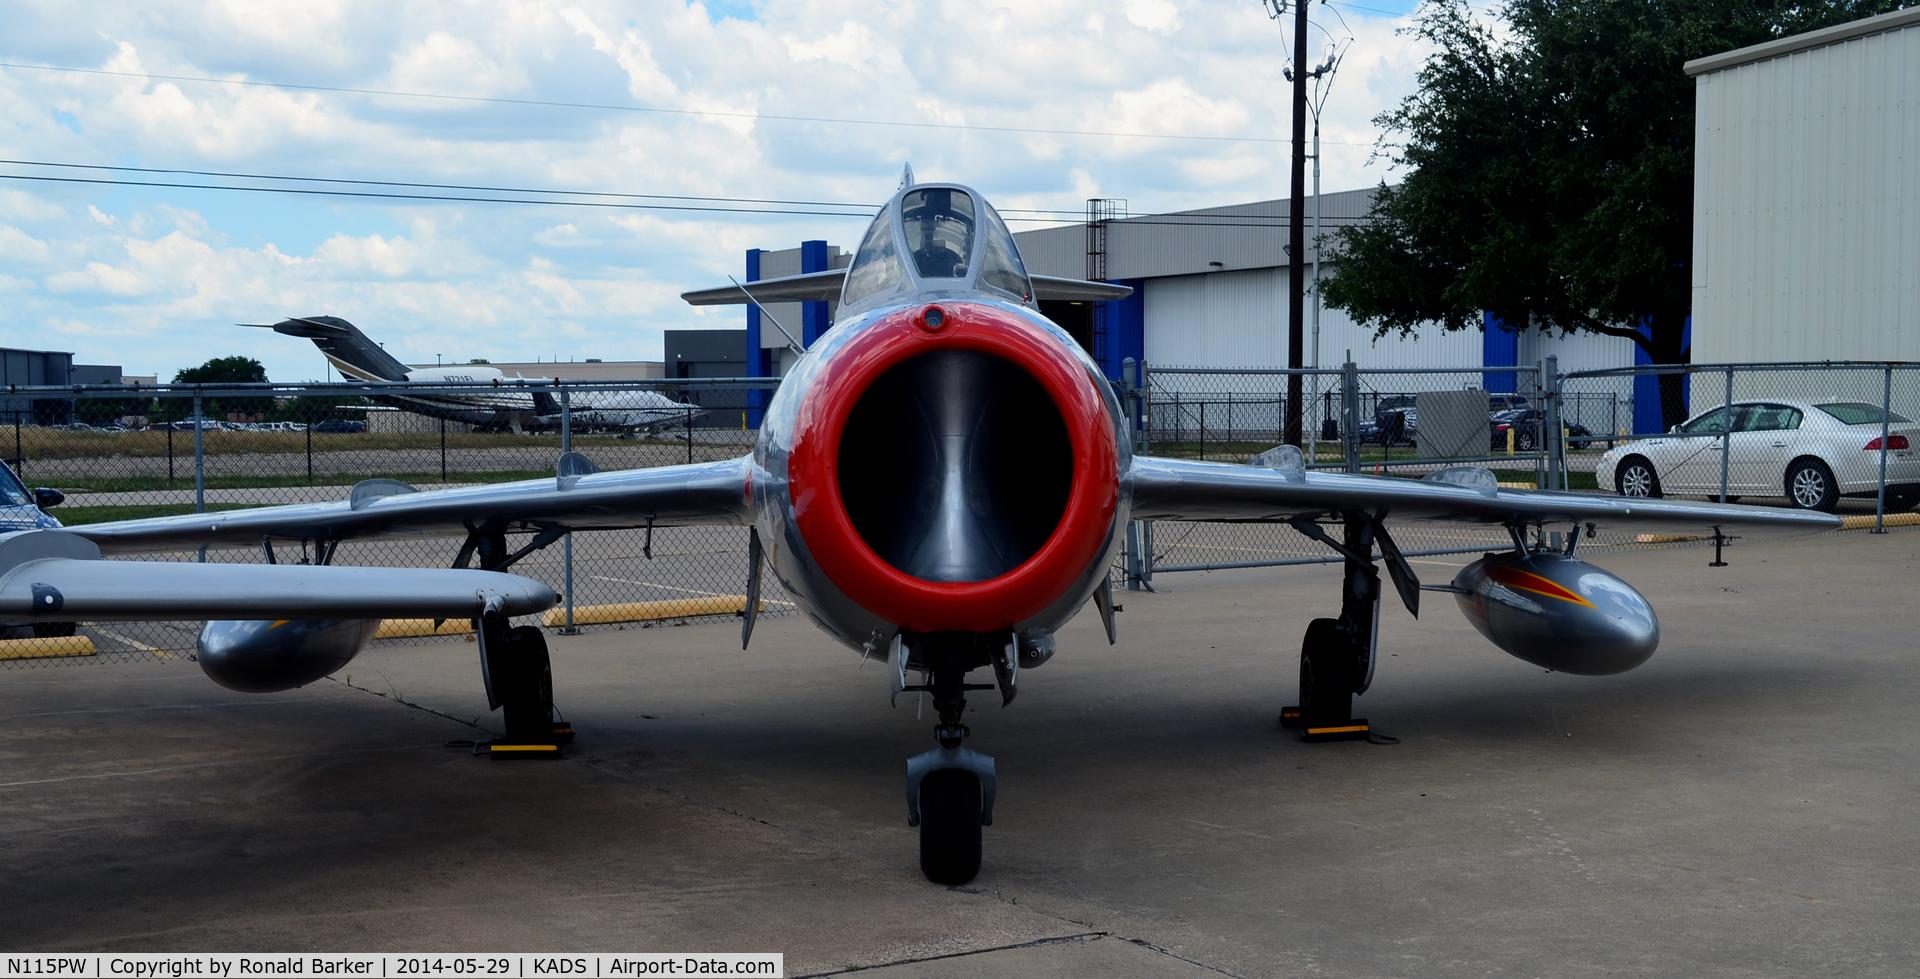 N115PW, 1955 Mikoyan-Gurevich SB LIM-2 C/N 512036, Cavanaugh Flight Museum Addison, TX